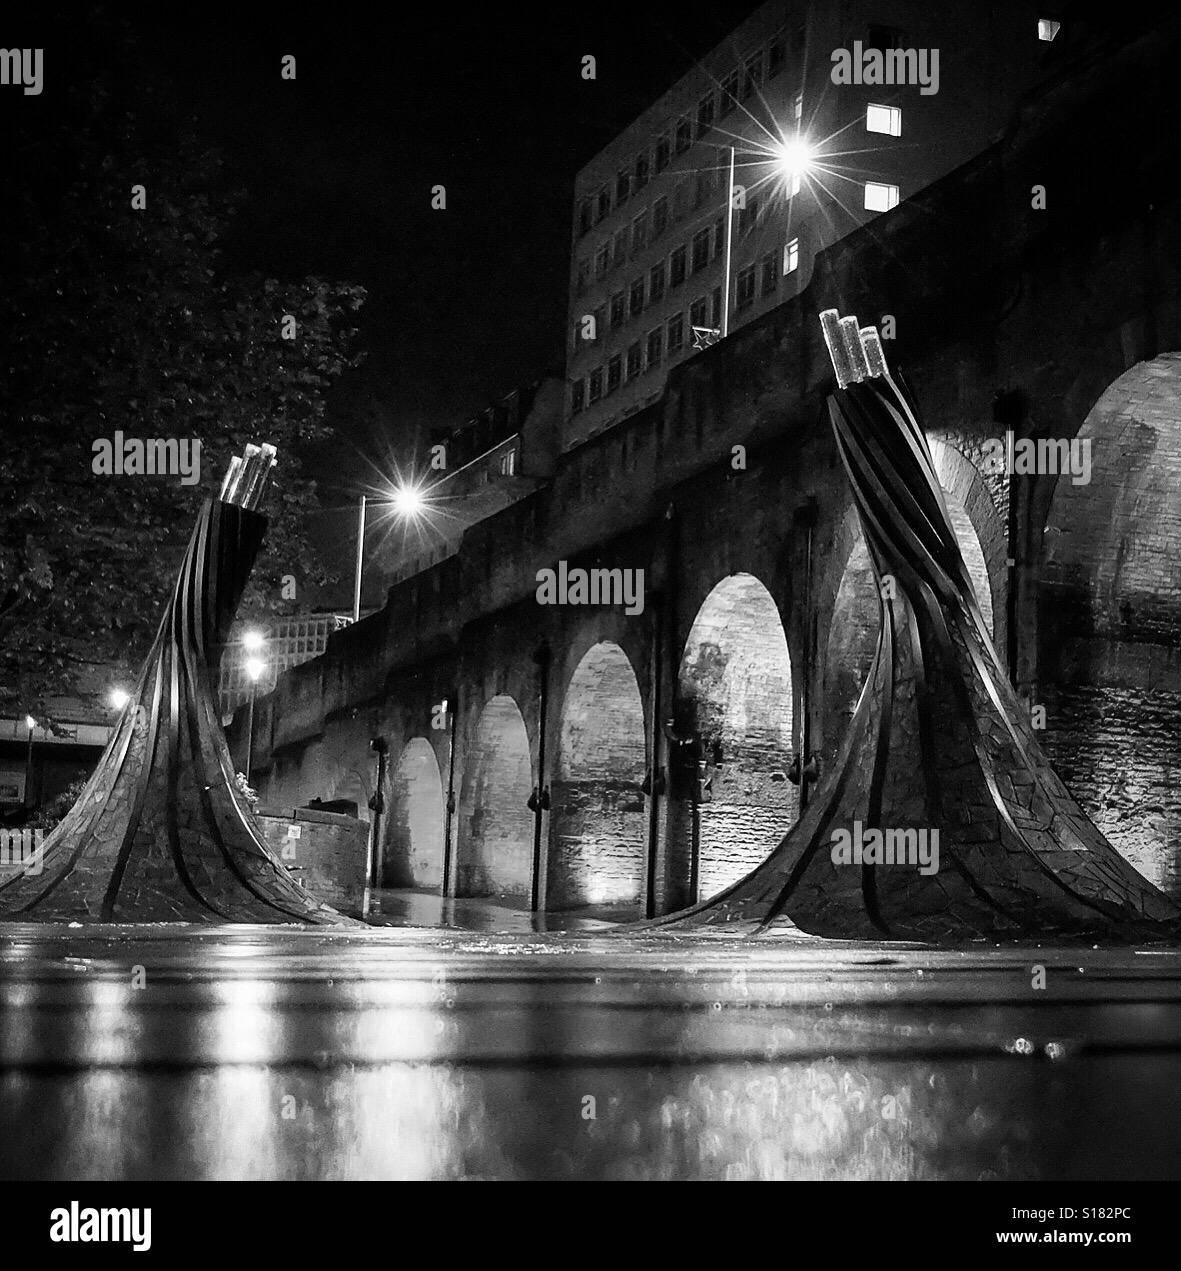 Fibres art installation at Bradford Forster Square. - Stock Image